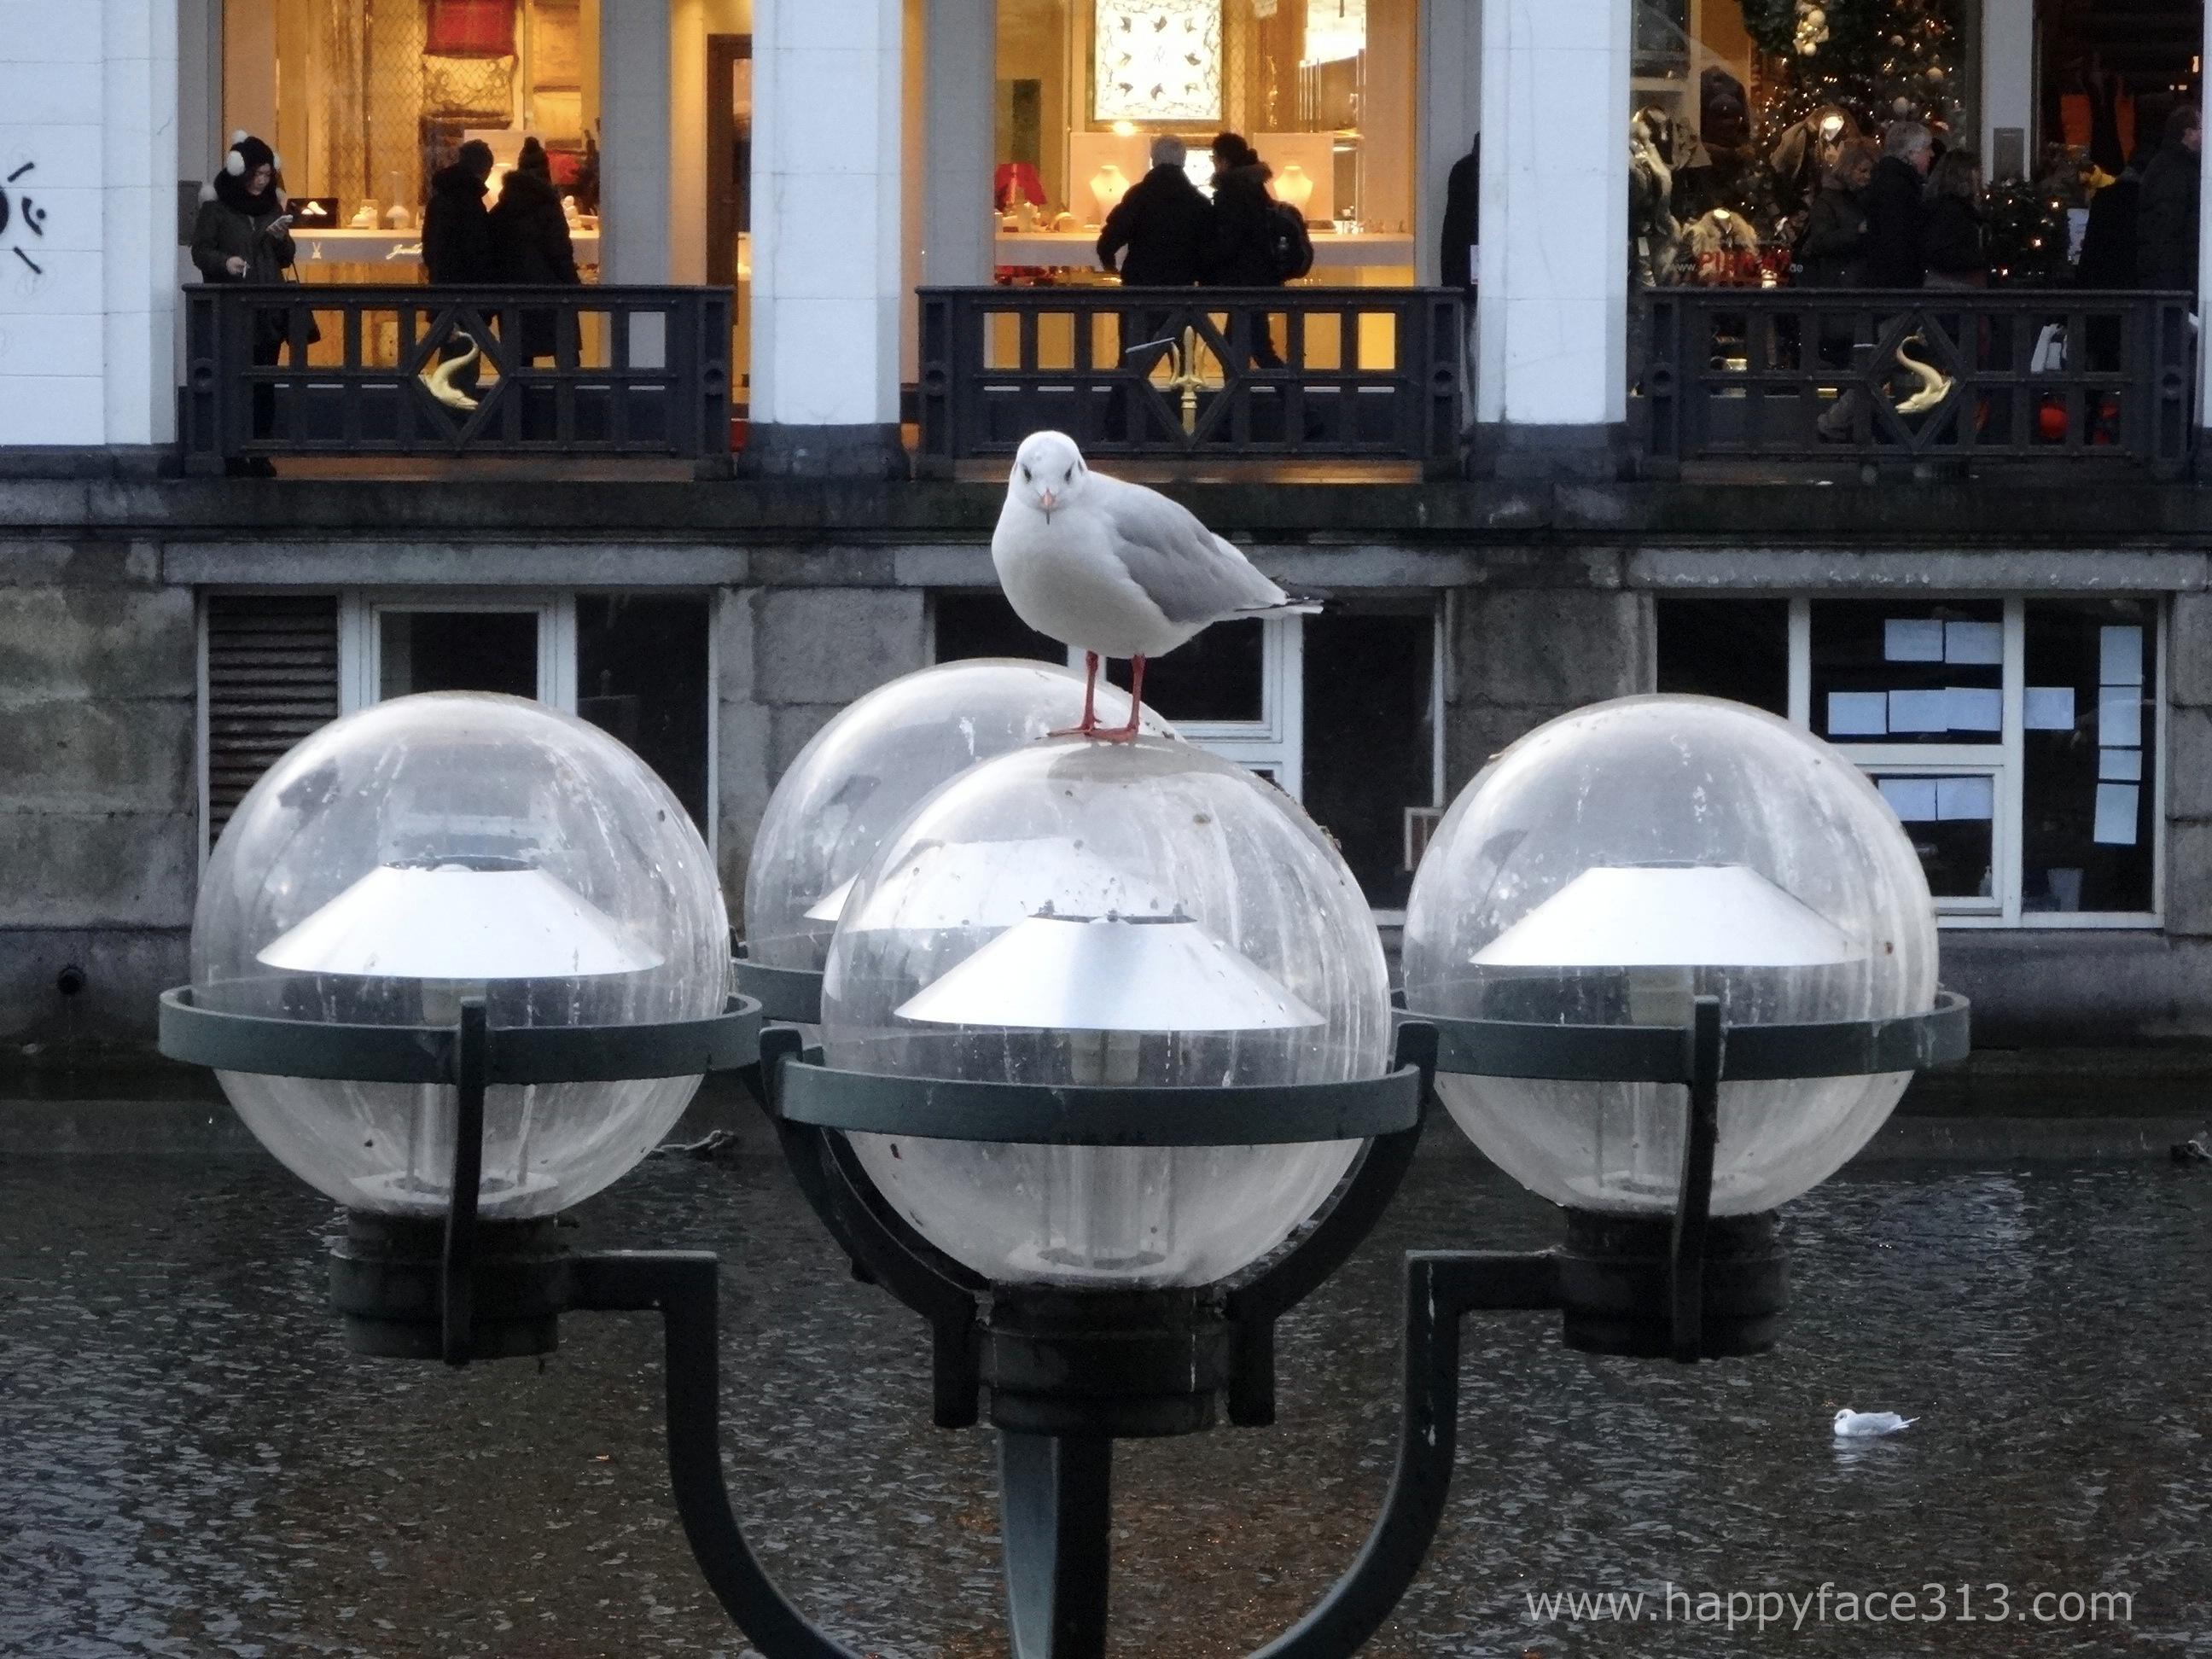 HappyFace313-seagull-serenity